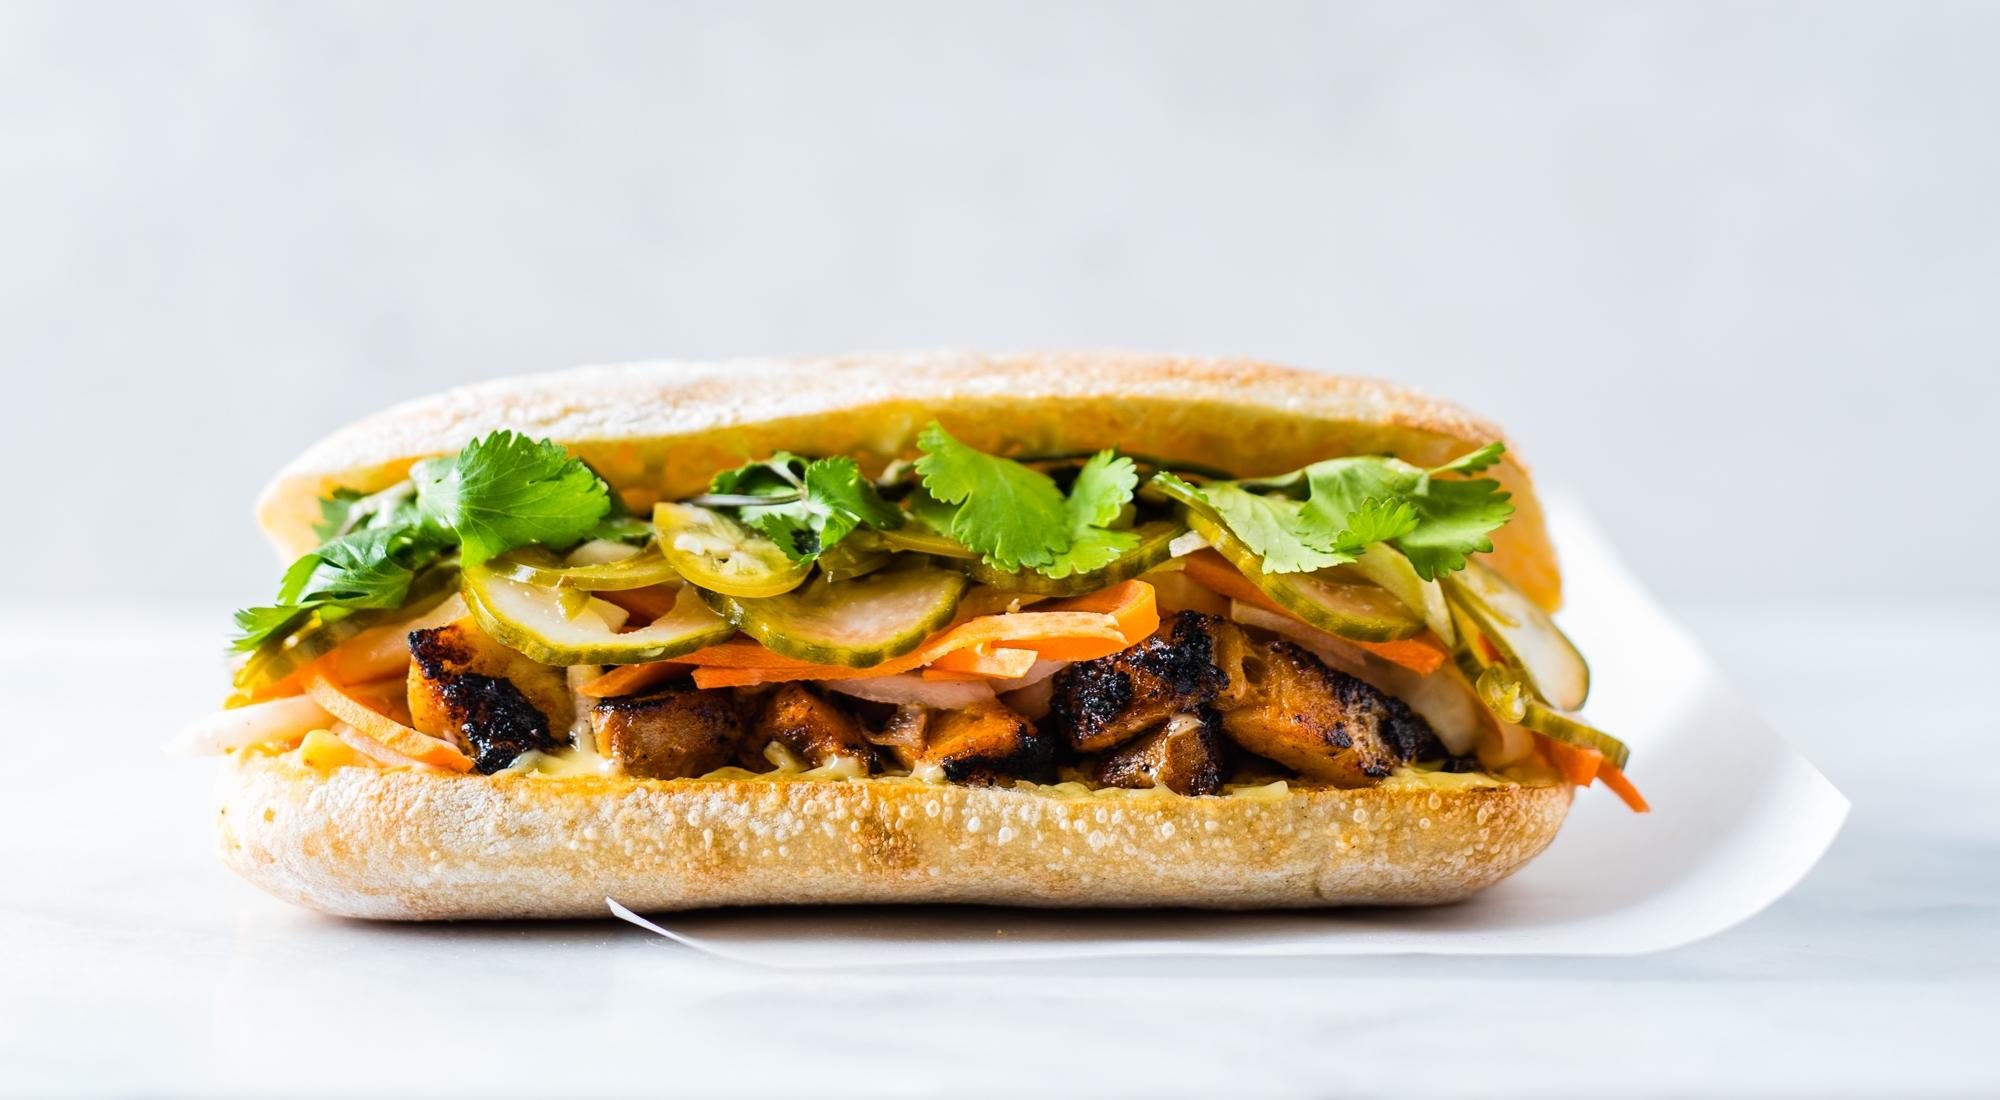 Pork + Pickles - CHILE-MUSTARD PORK BELLY, ASIAN PICKLES, CILANTRO, KOJI MAYO, CIABATTA (SPICY)